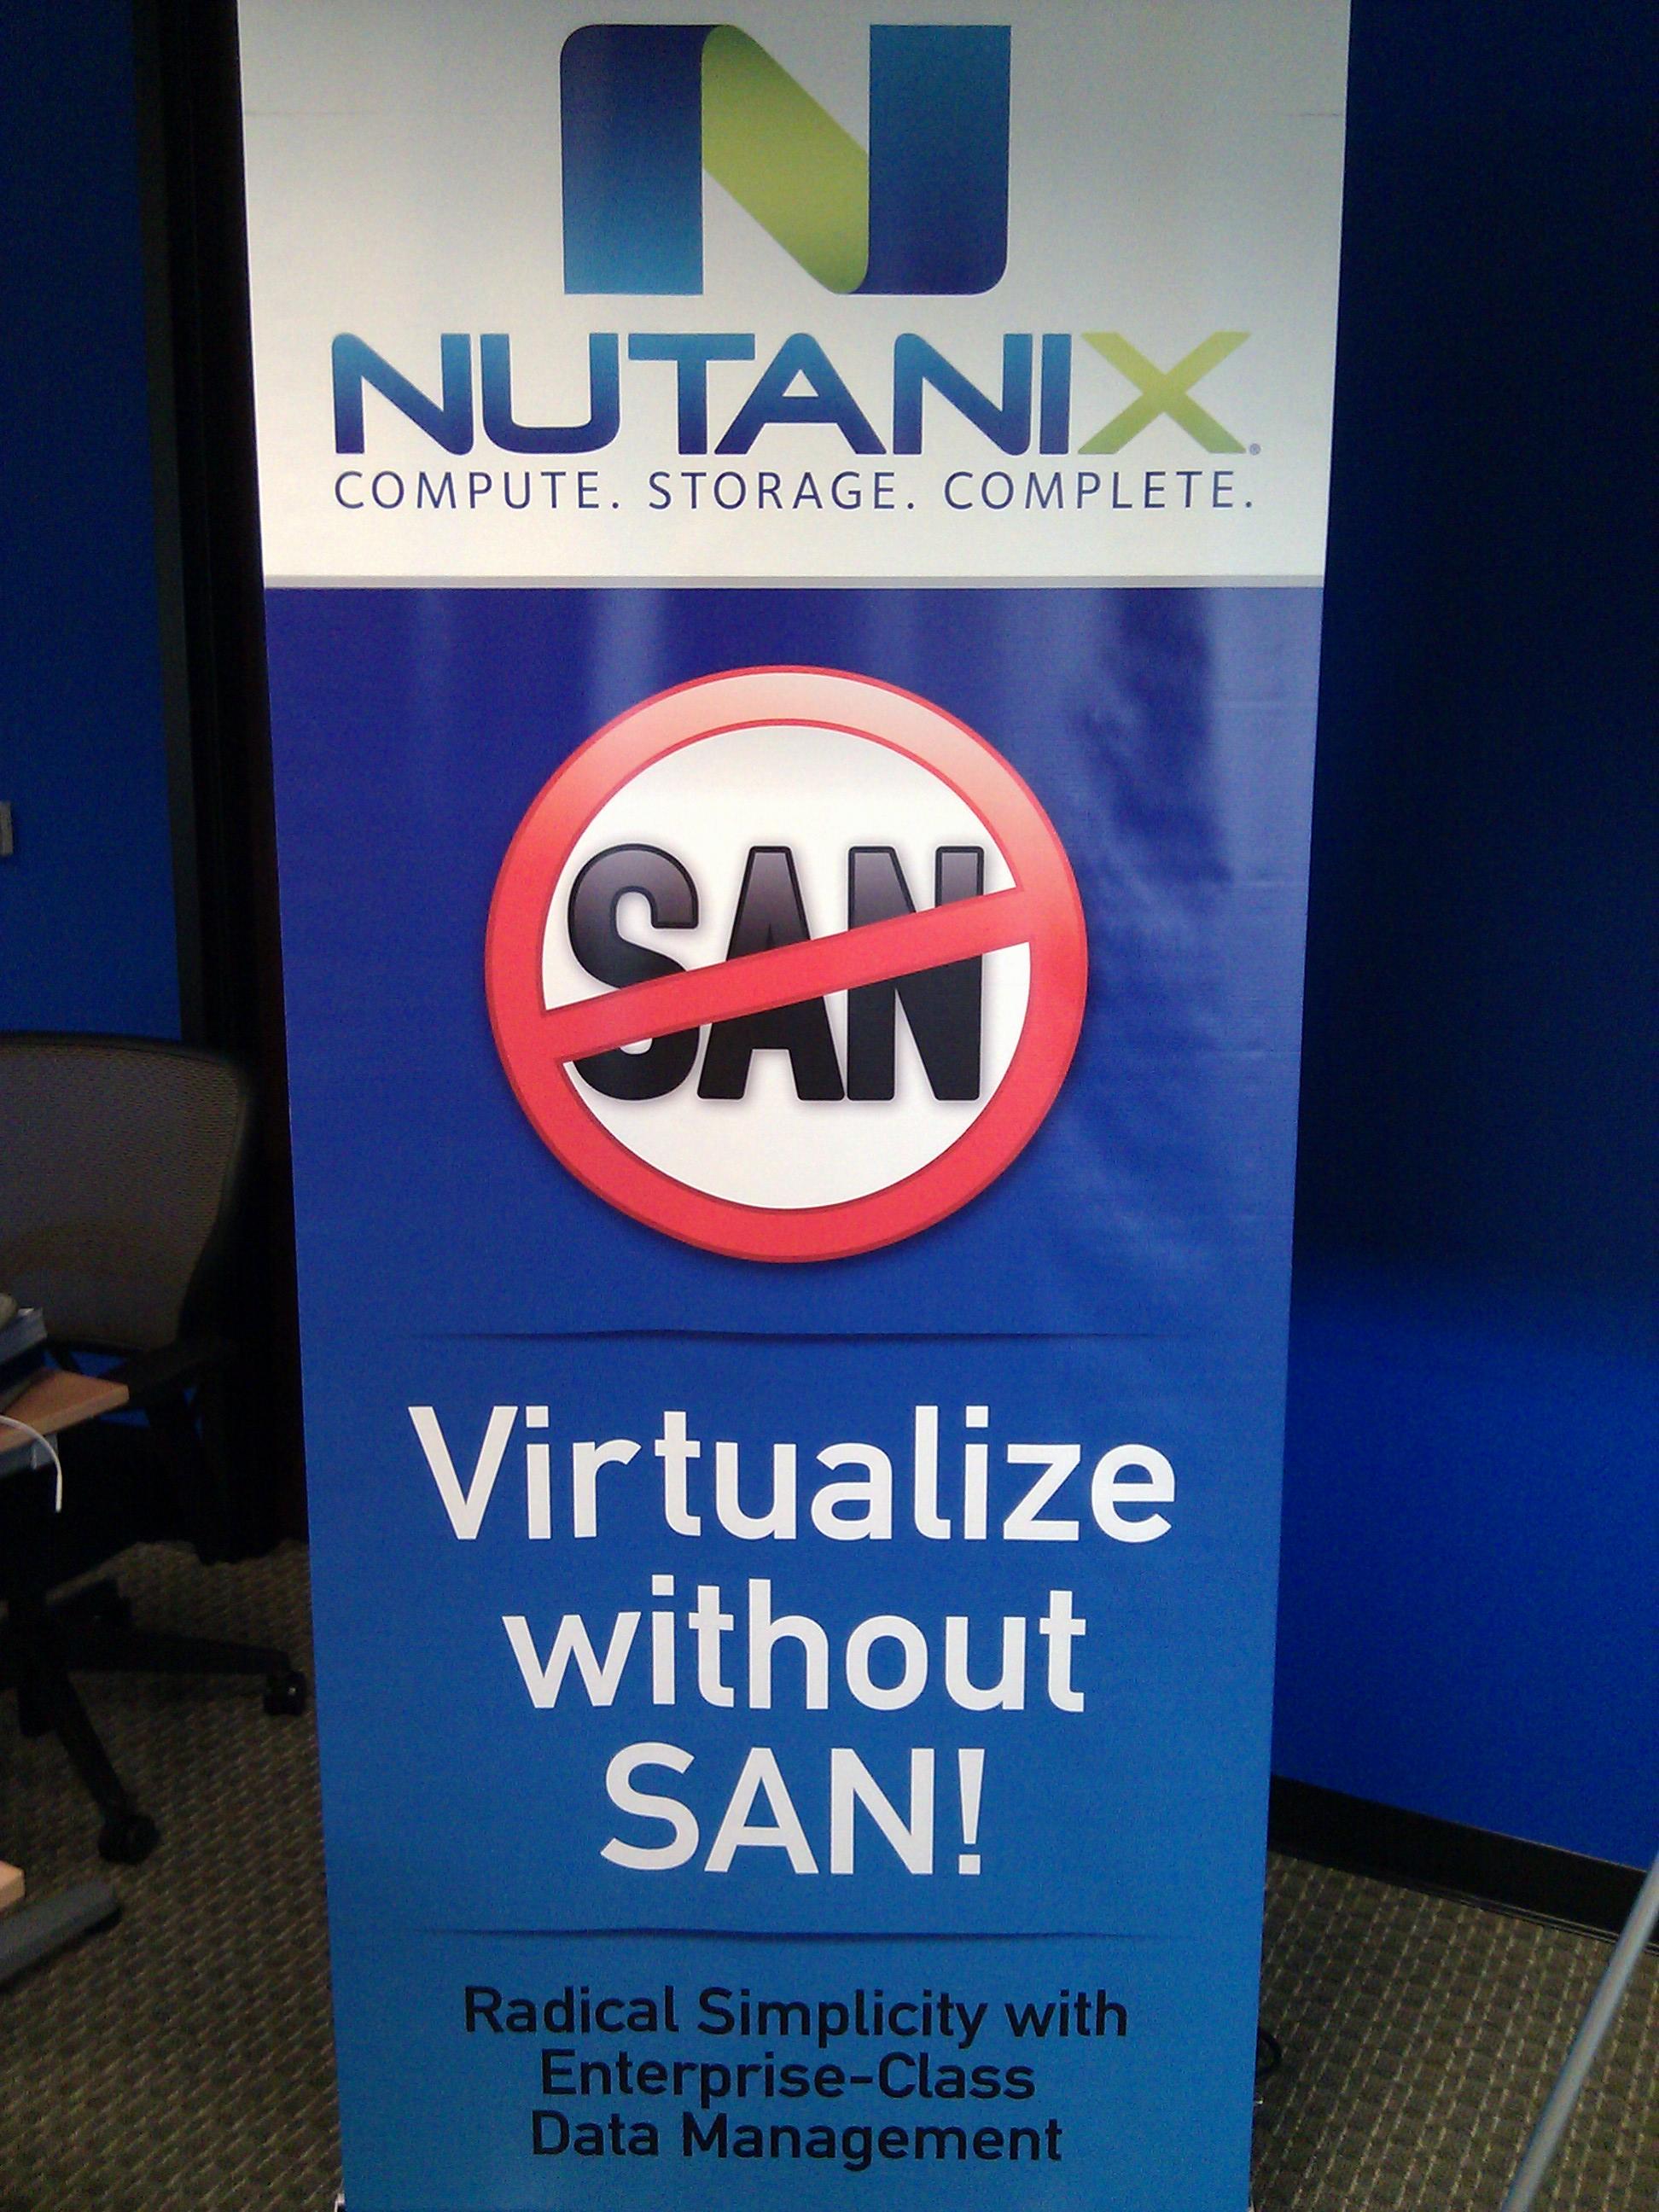 nutanix-nosan-bunting